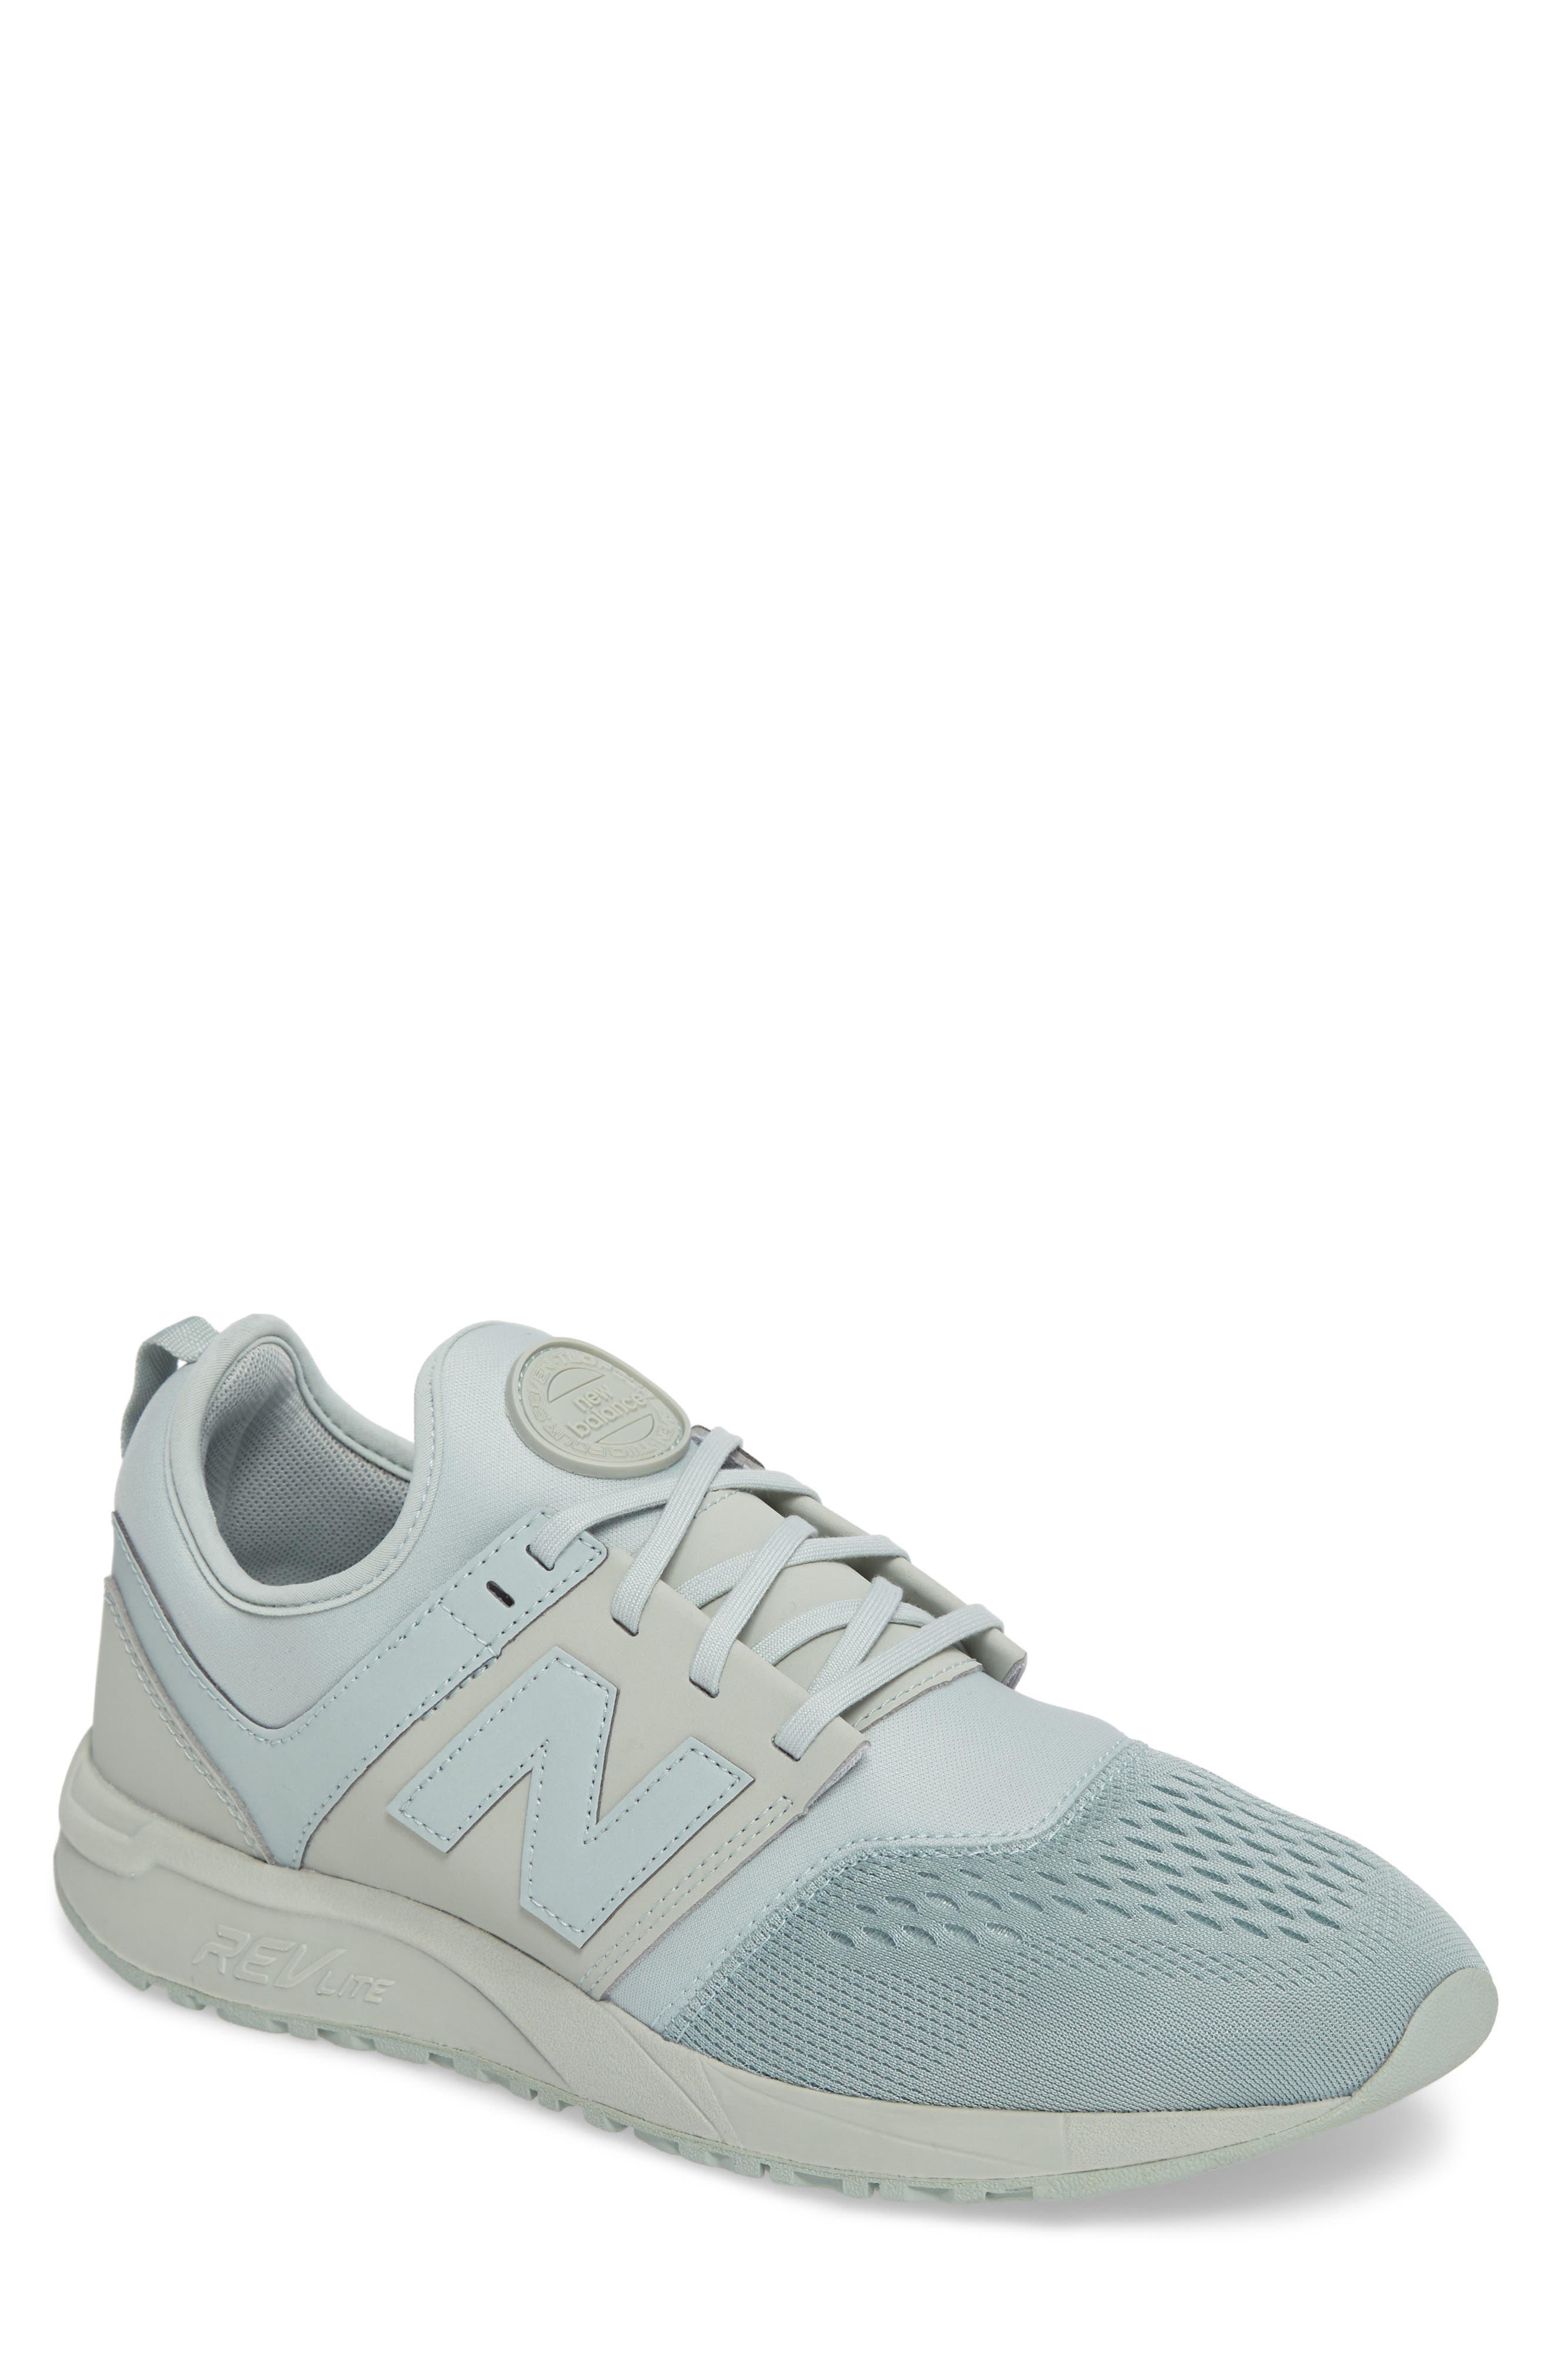 New Balance 247 Sport Sneaker (Men)